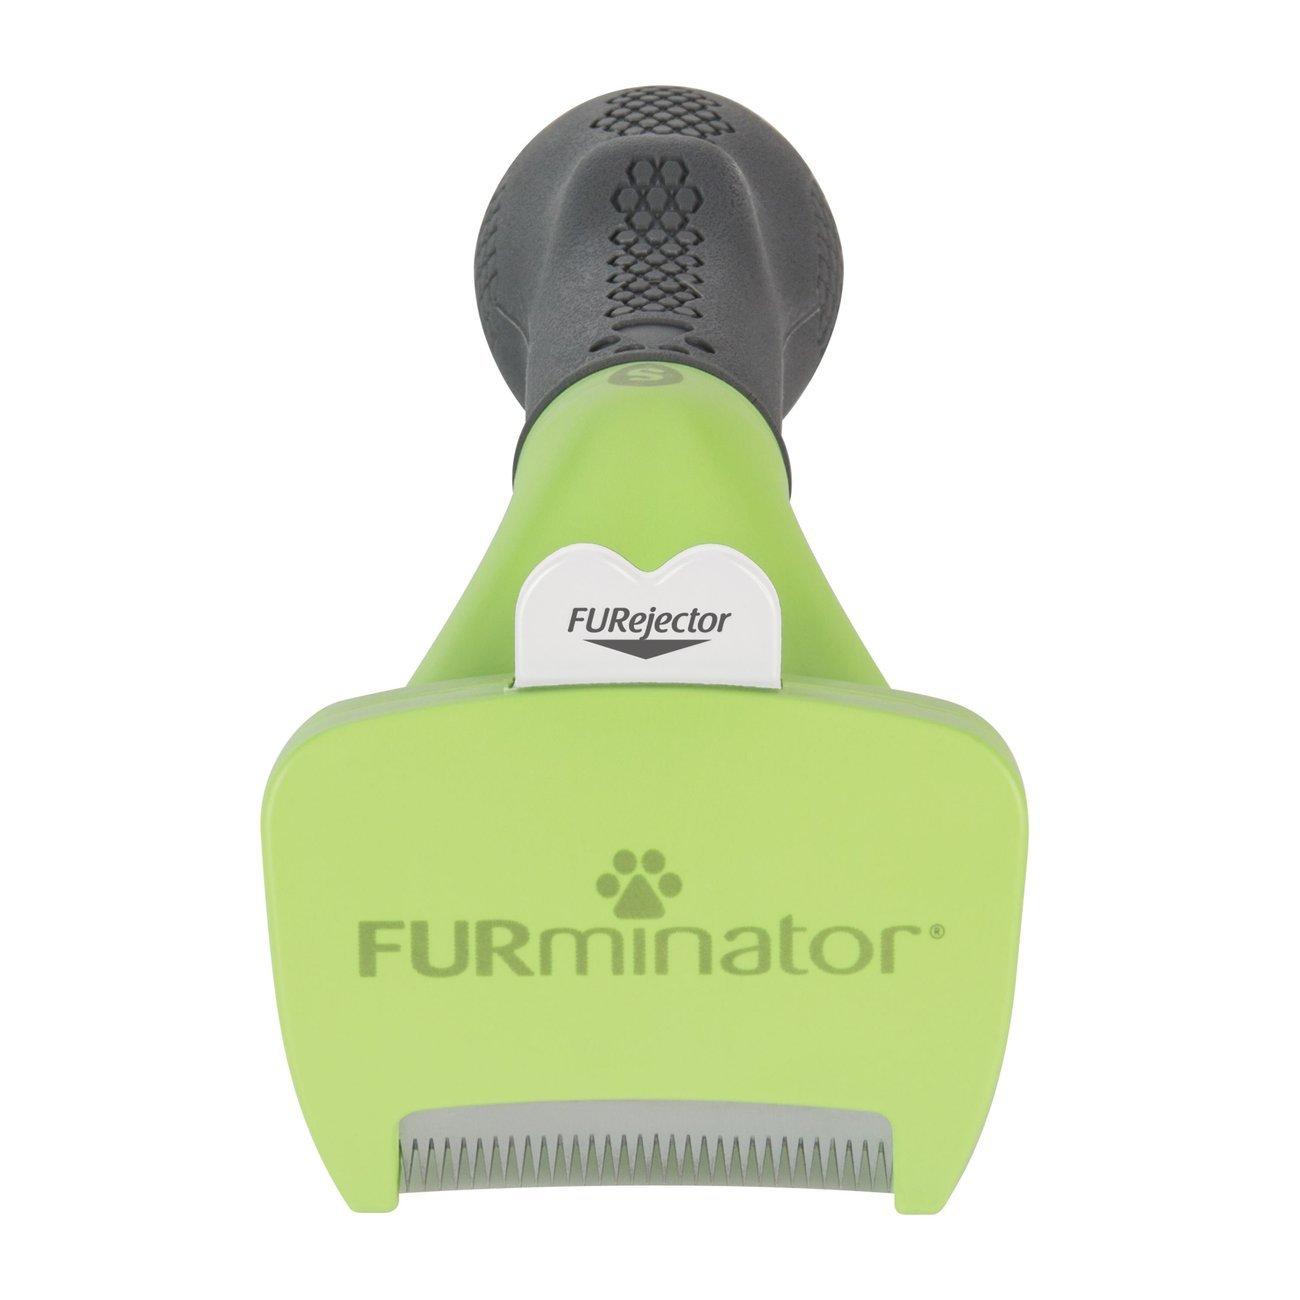 FURminator Hund Unterwolle Kurzhaar, Bild 14